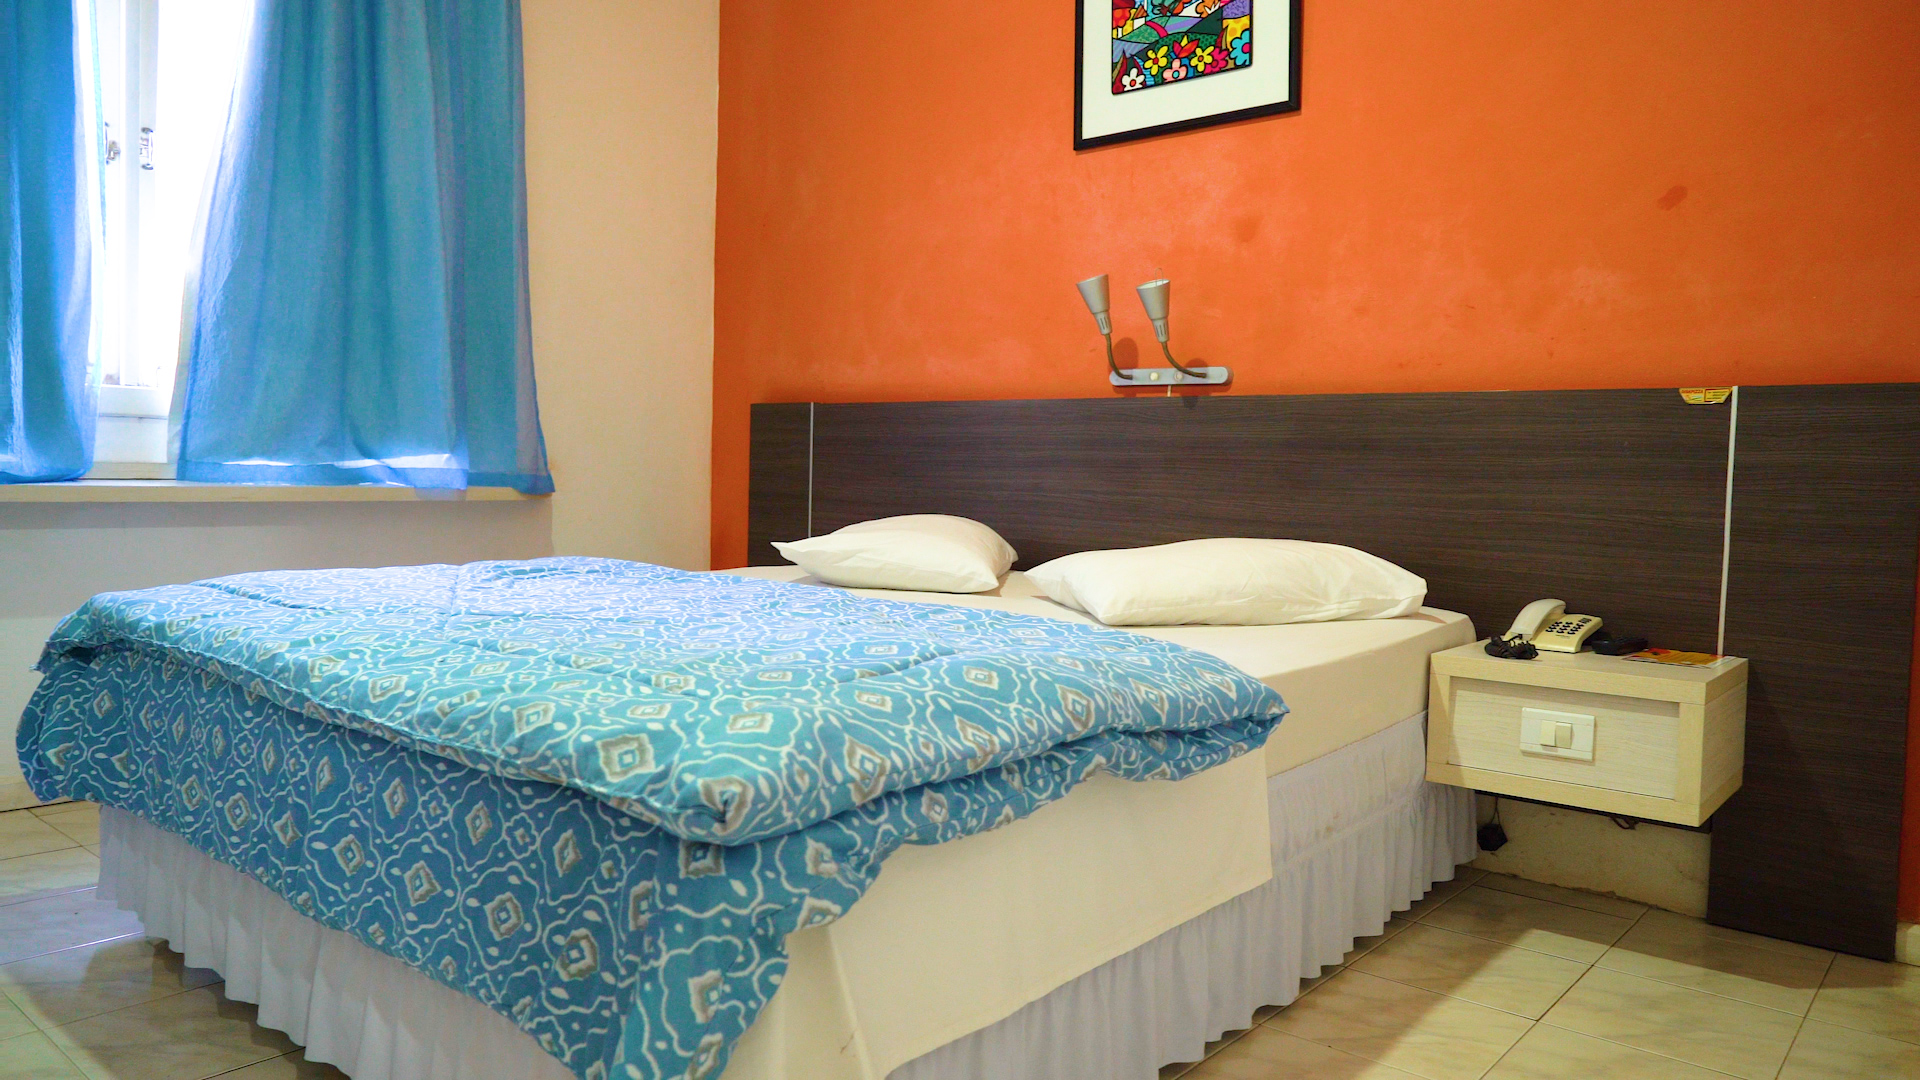 Itacaiúnas Hotel - Apartamento Single